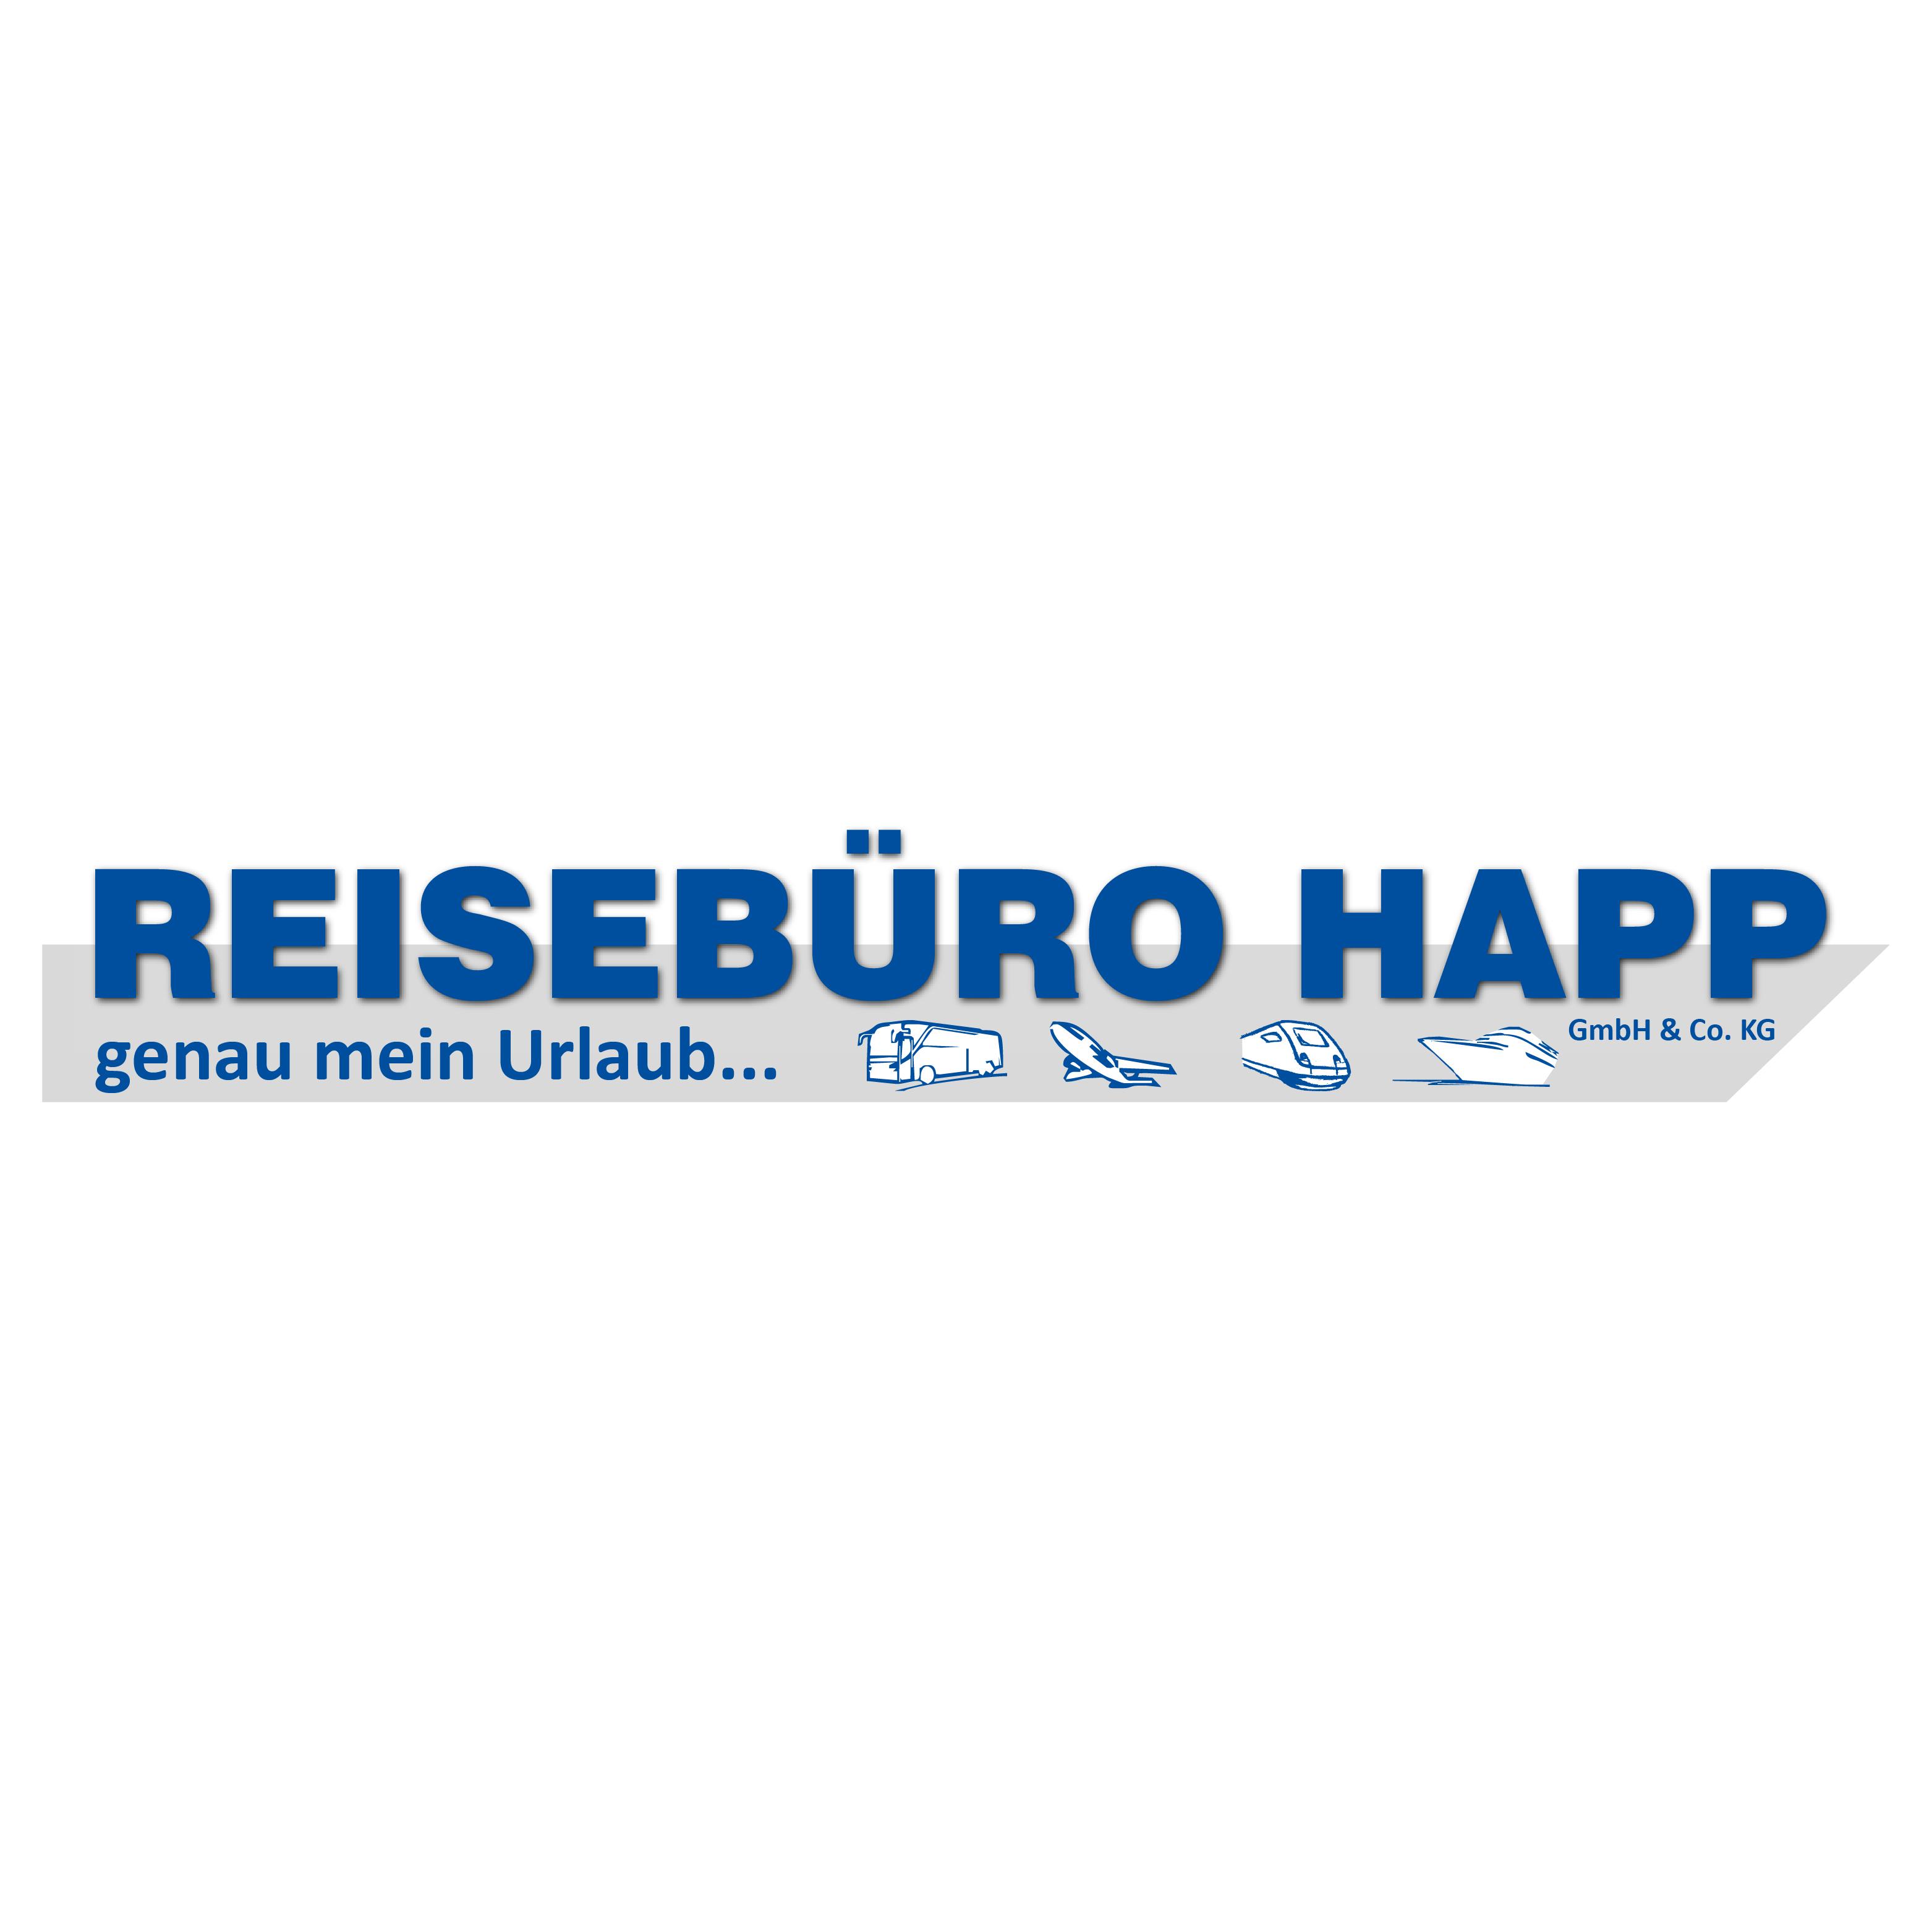 Reisebüro Happ GmbH & Co. KG